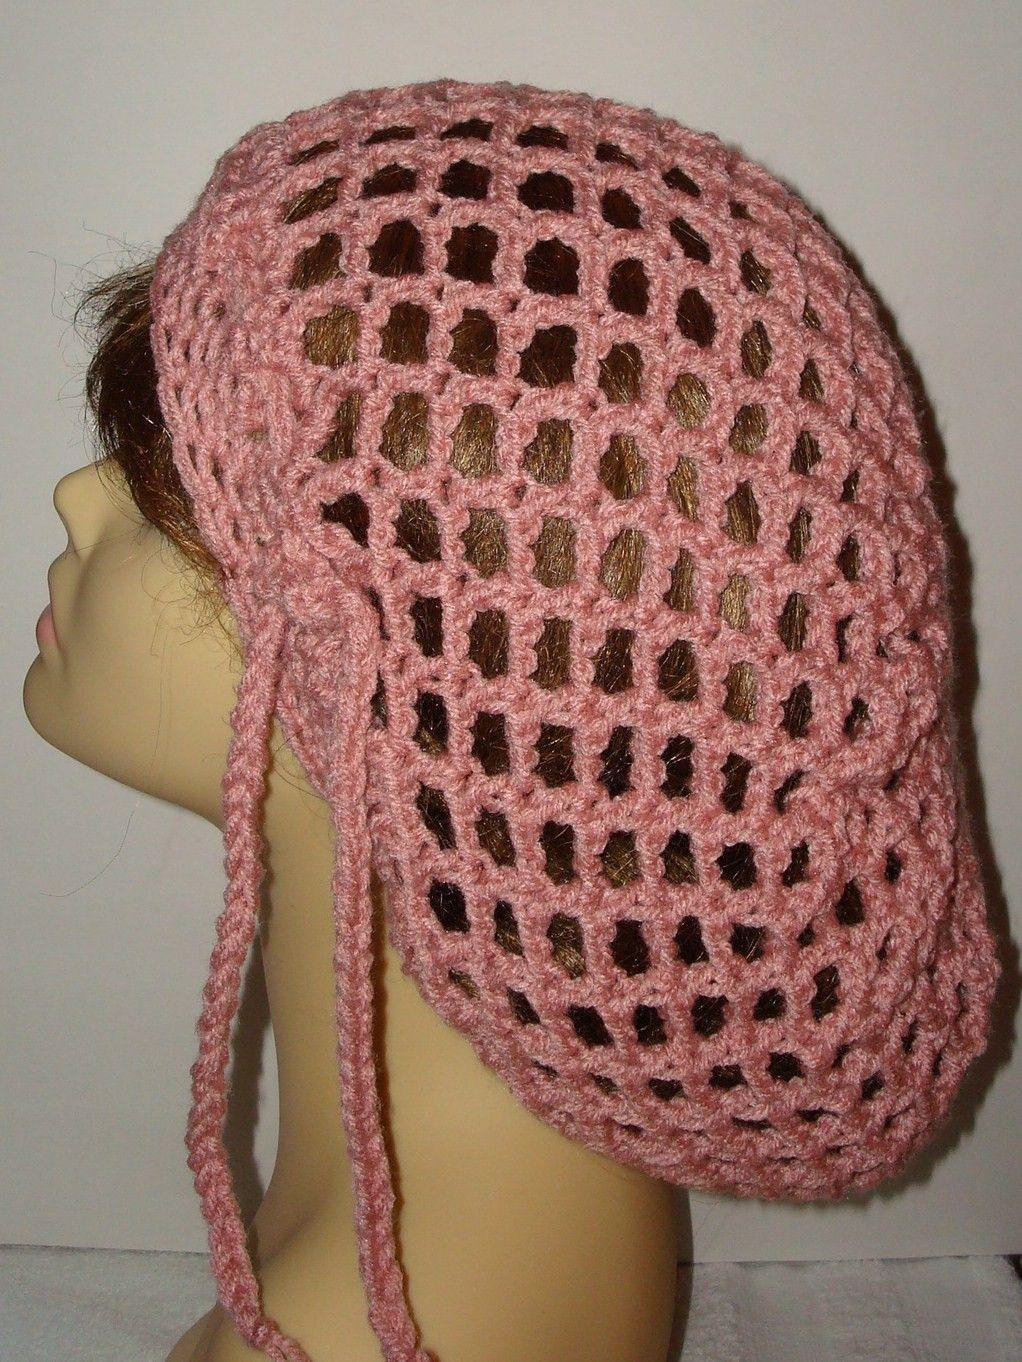 Knitting Pattern For Dreadlock Hat : KNITTING PATTERN RASTA HAT - FREE PATTERNS Crochet Pinterest Knitting p...